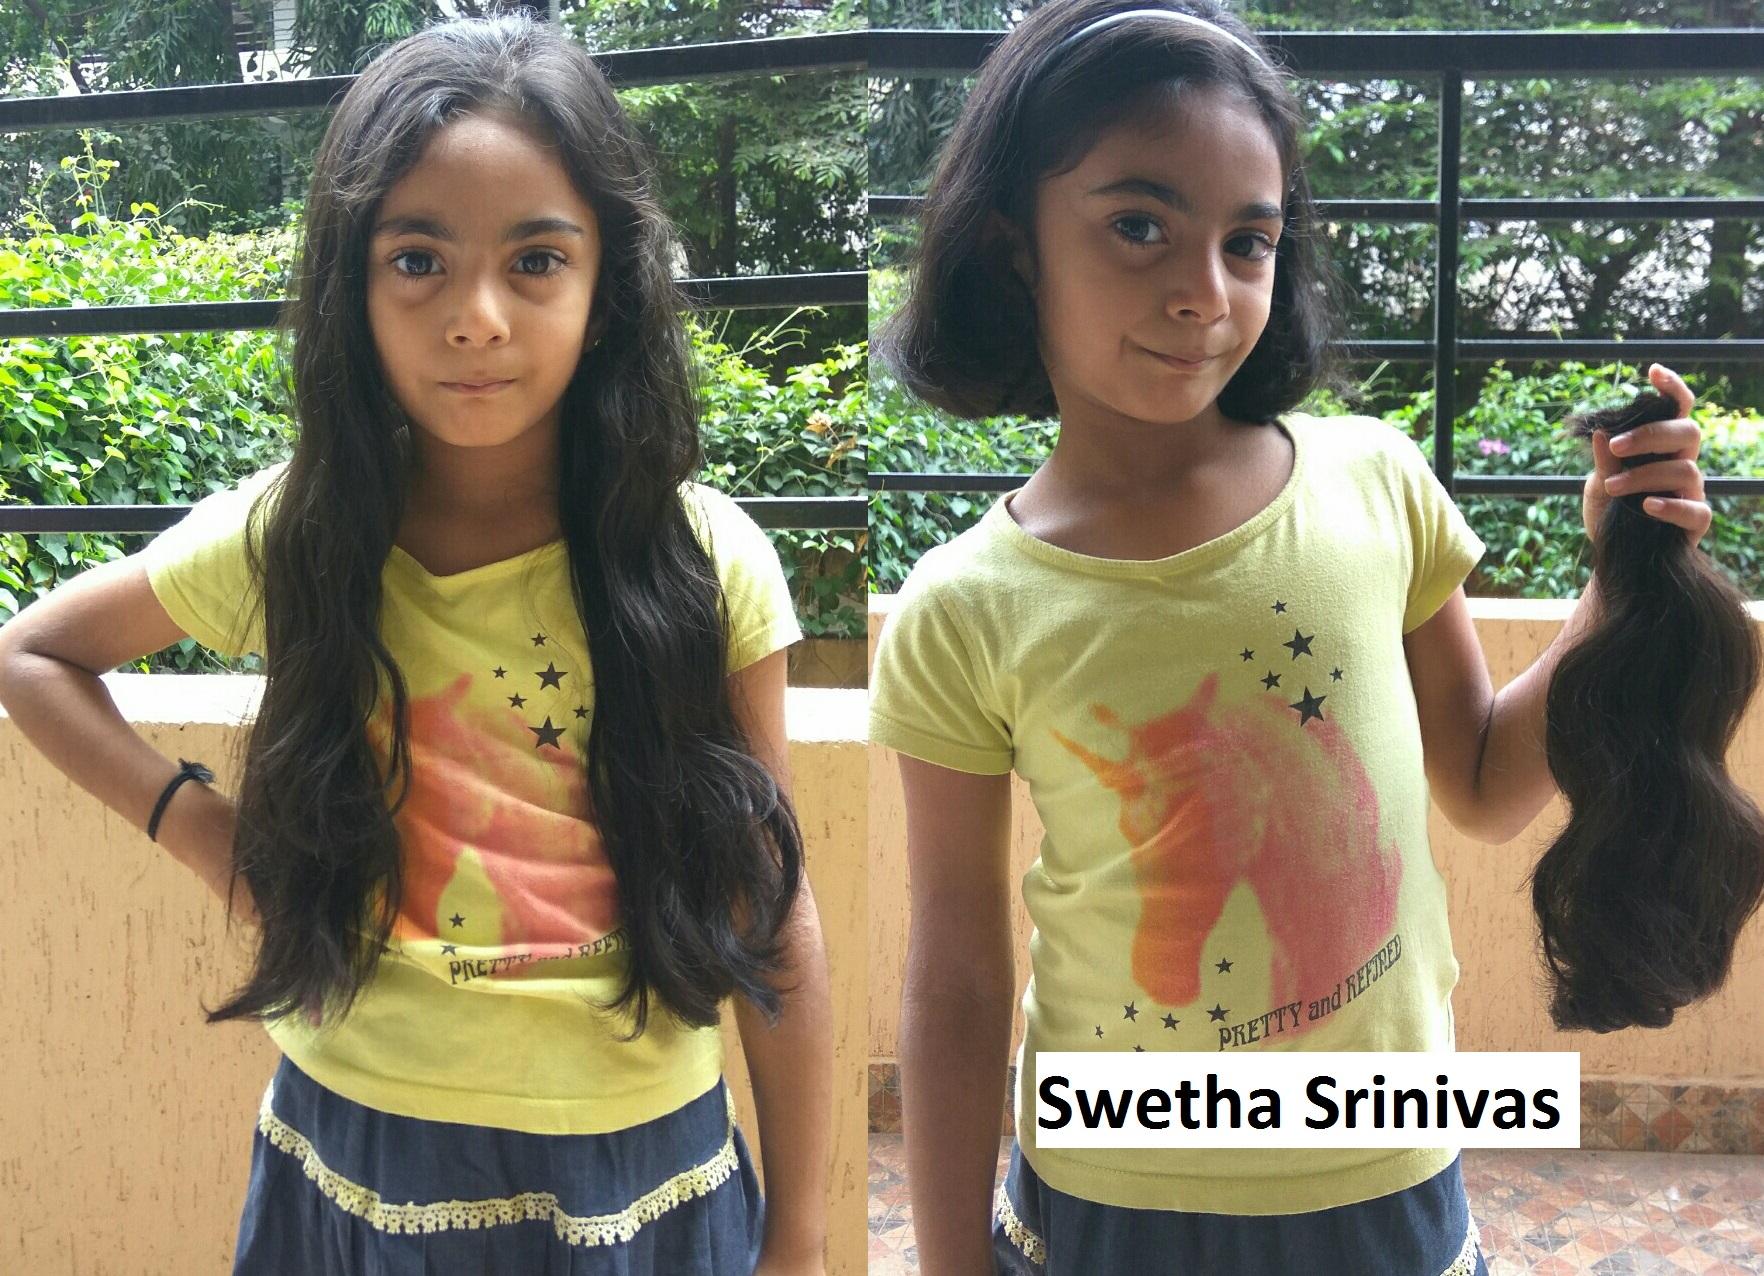 Swetha Srinivas